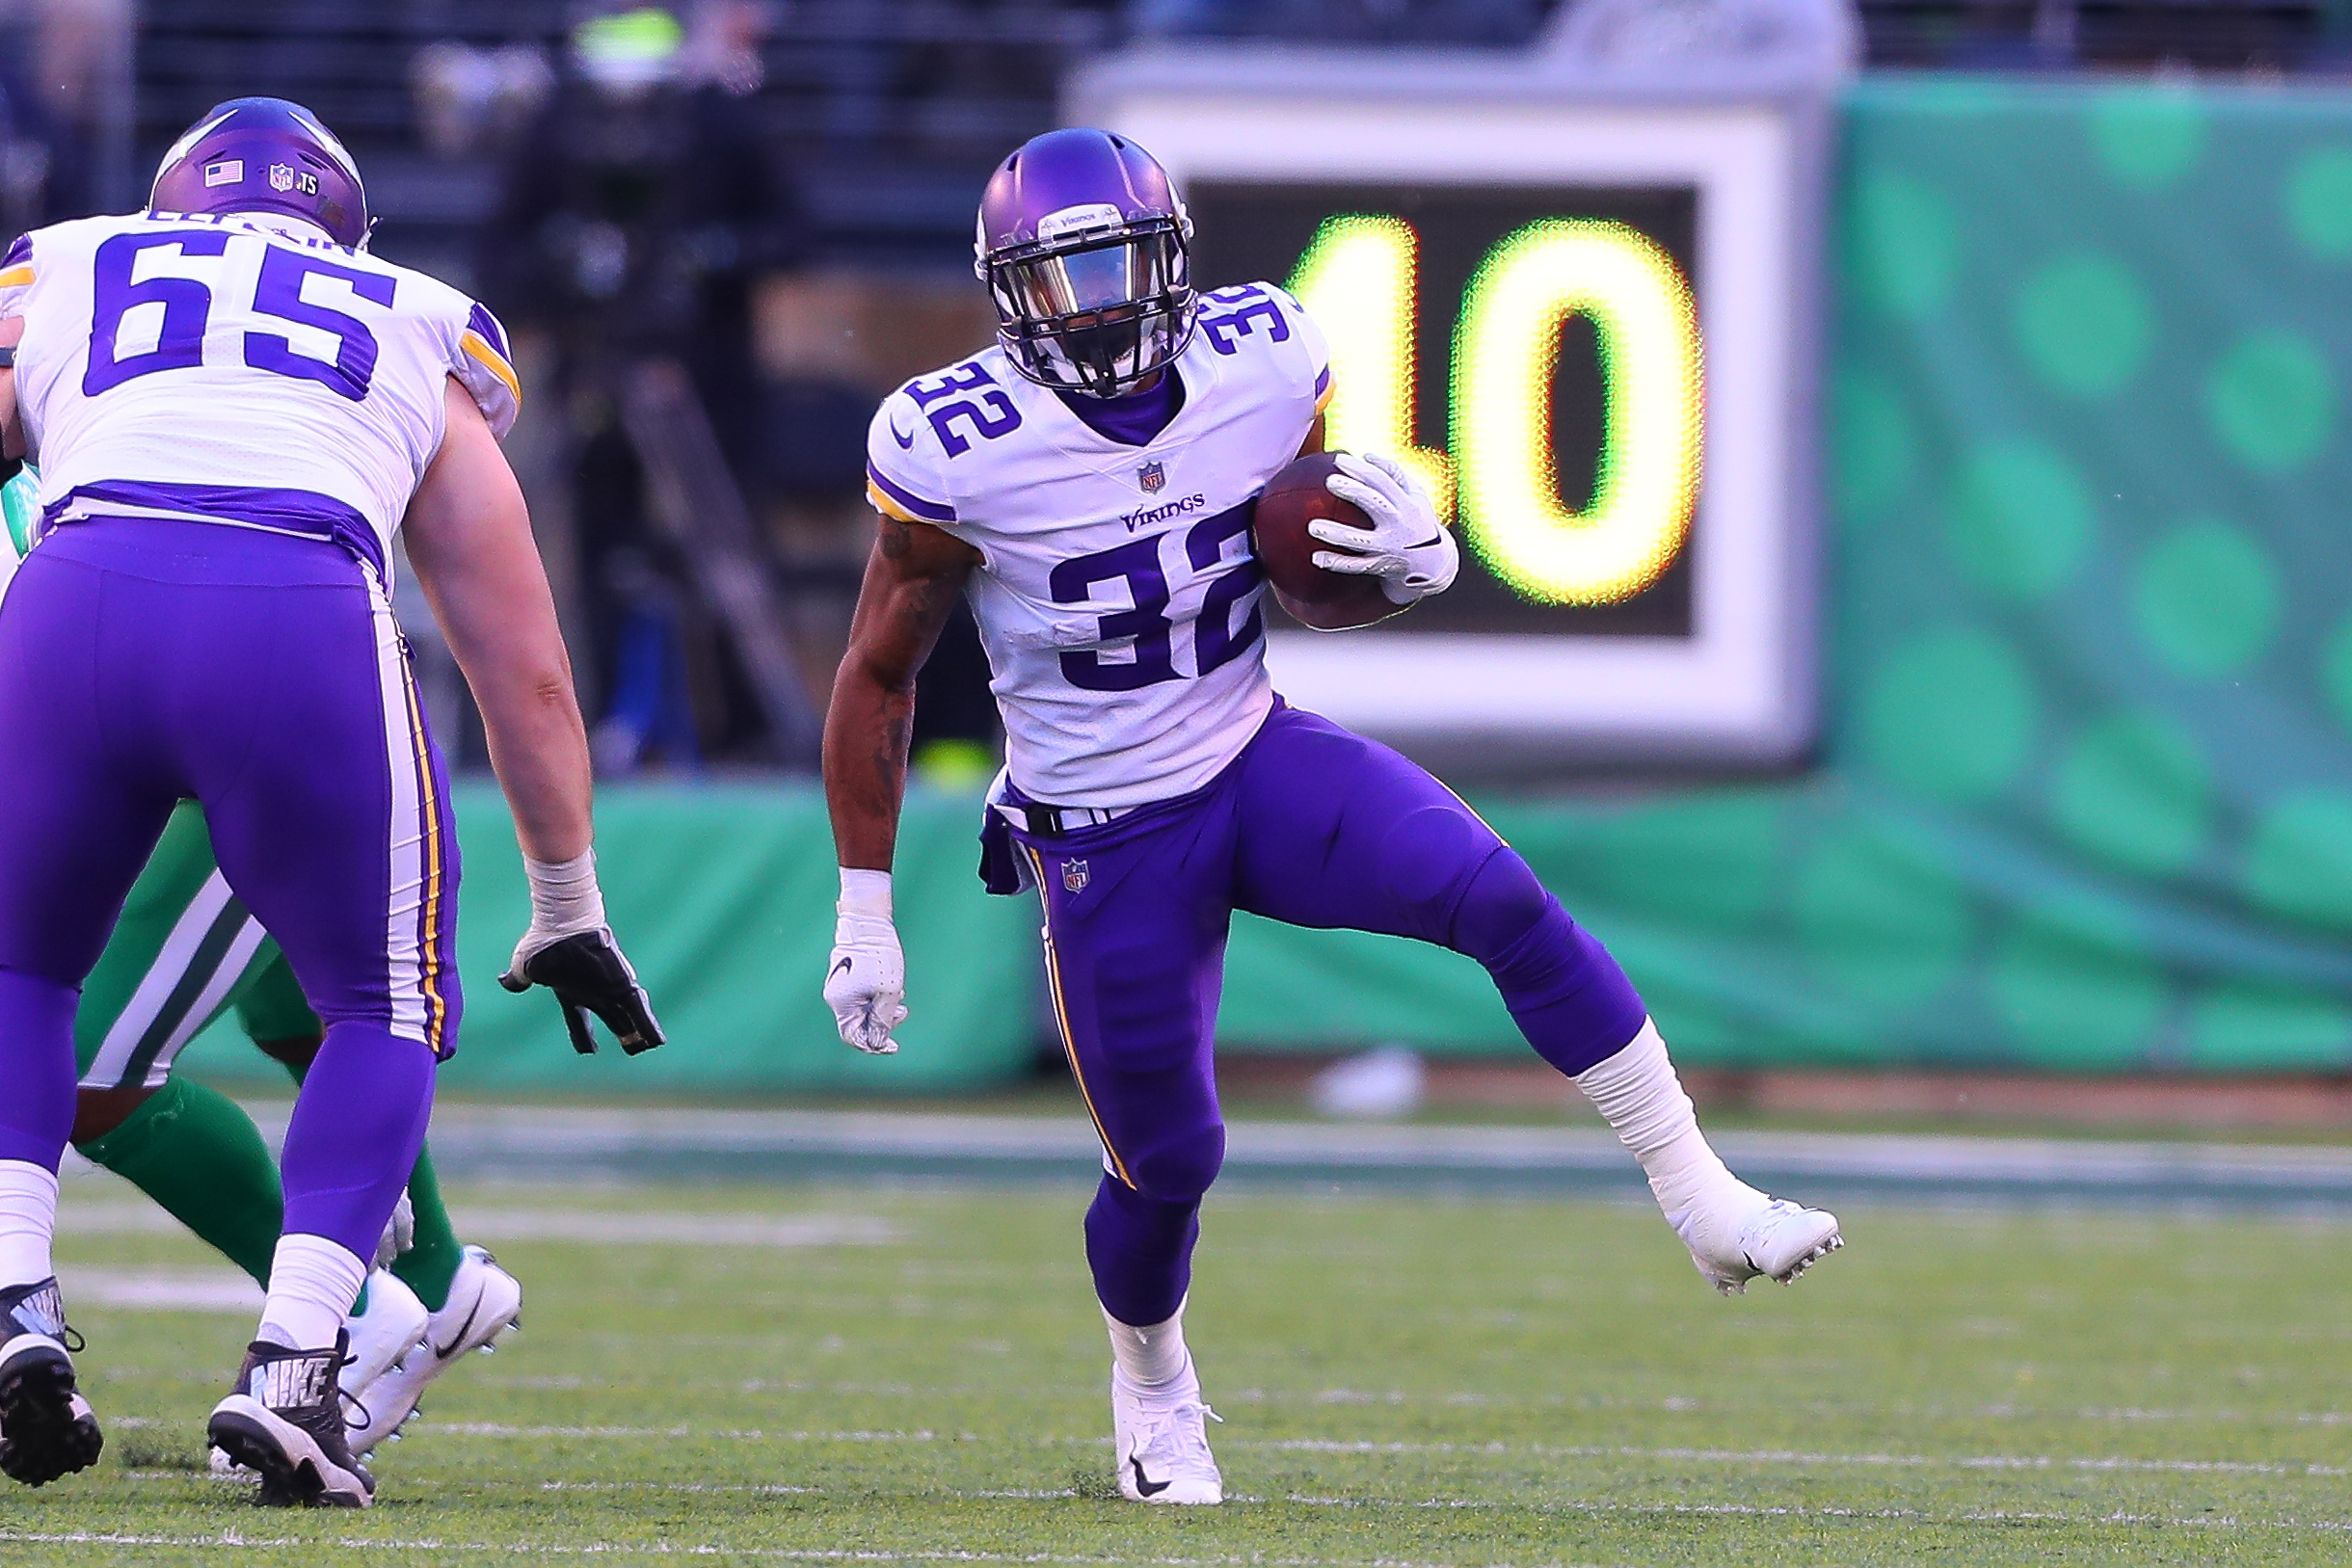 NFL: OCT 21 Vikings at Jets